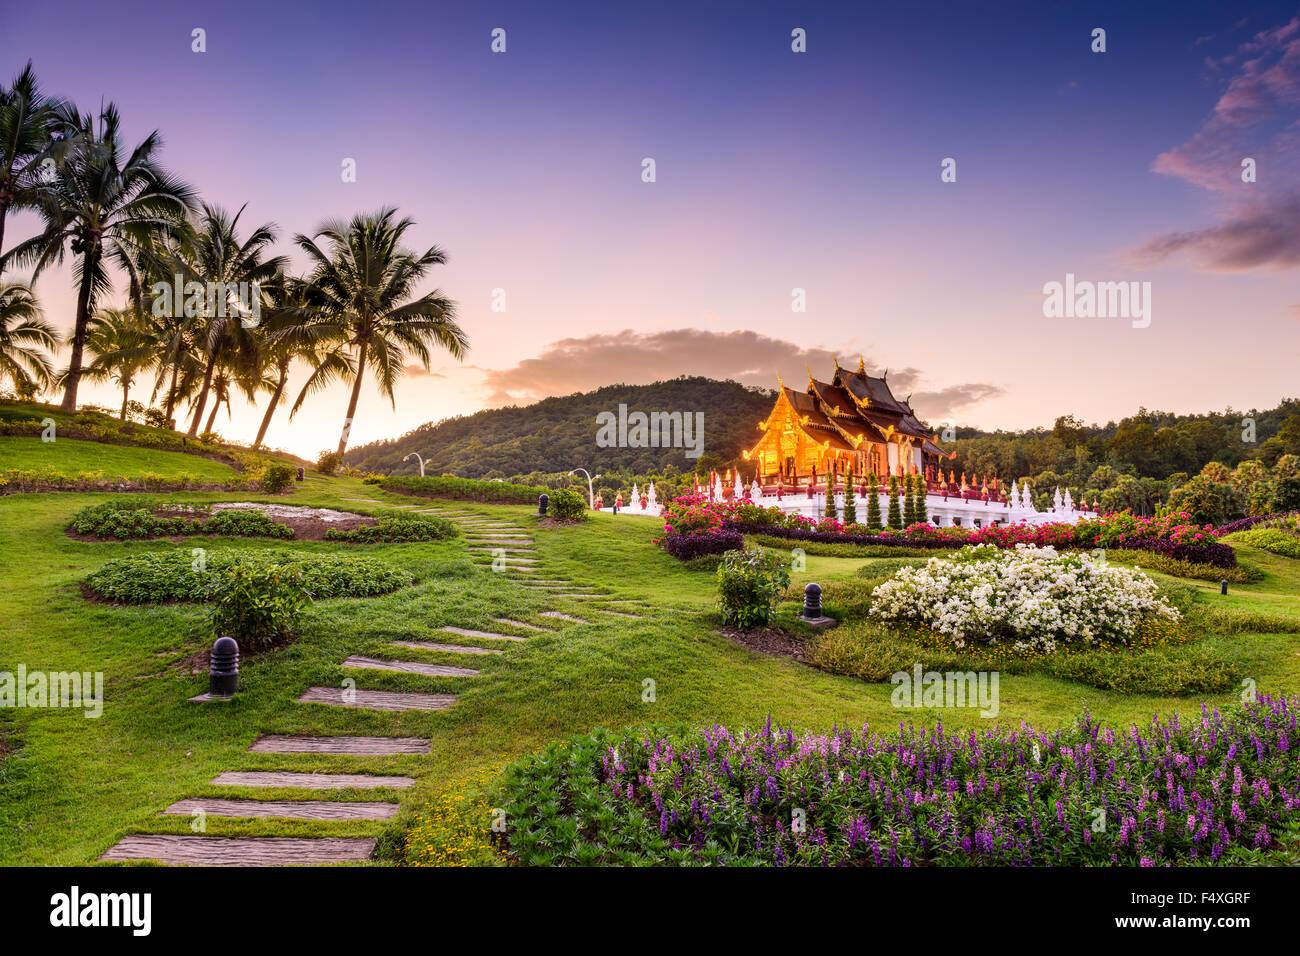 Chiang Mai, Tailandia, en Royal Flora Ratchaphruek Park. Foto de stock